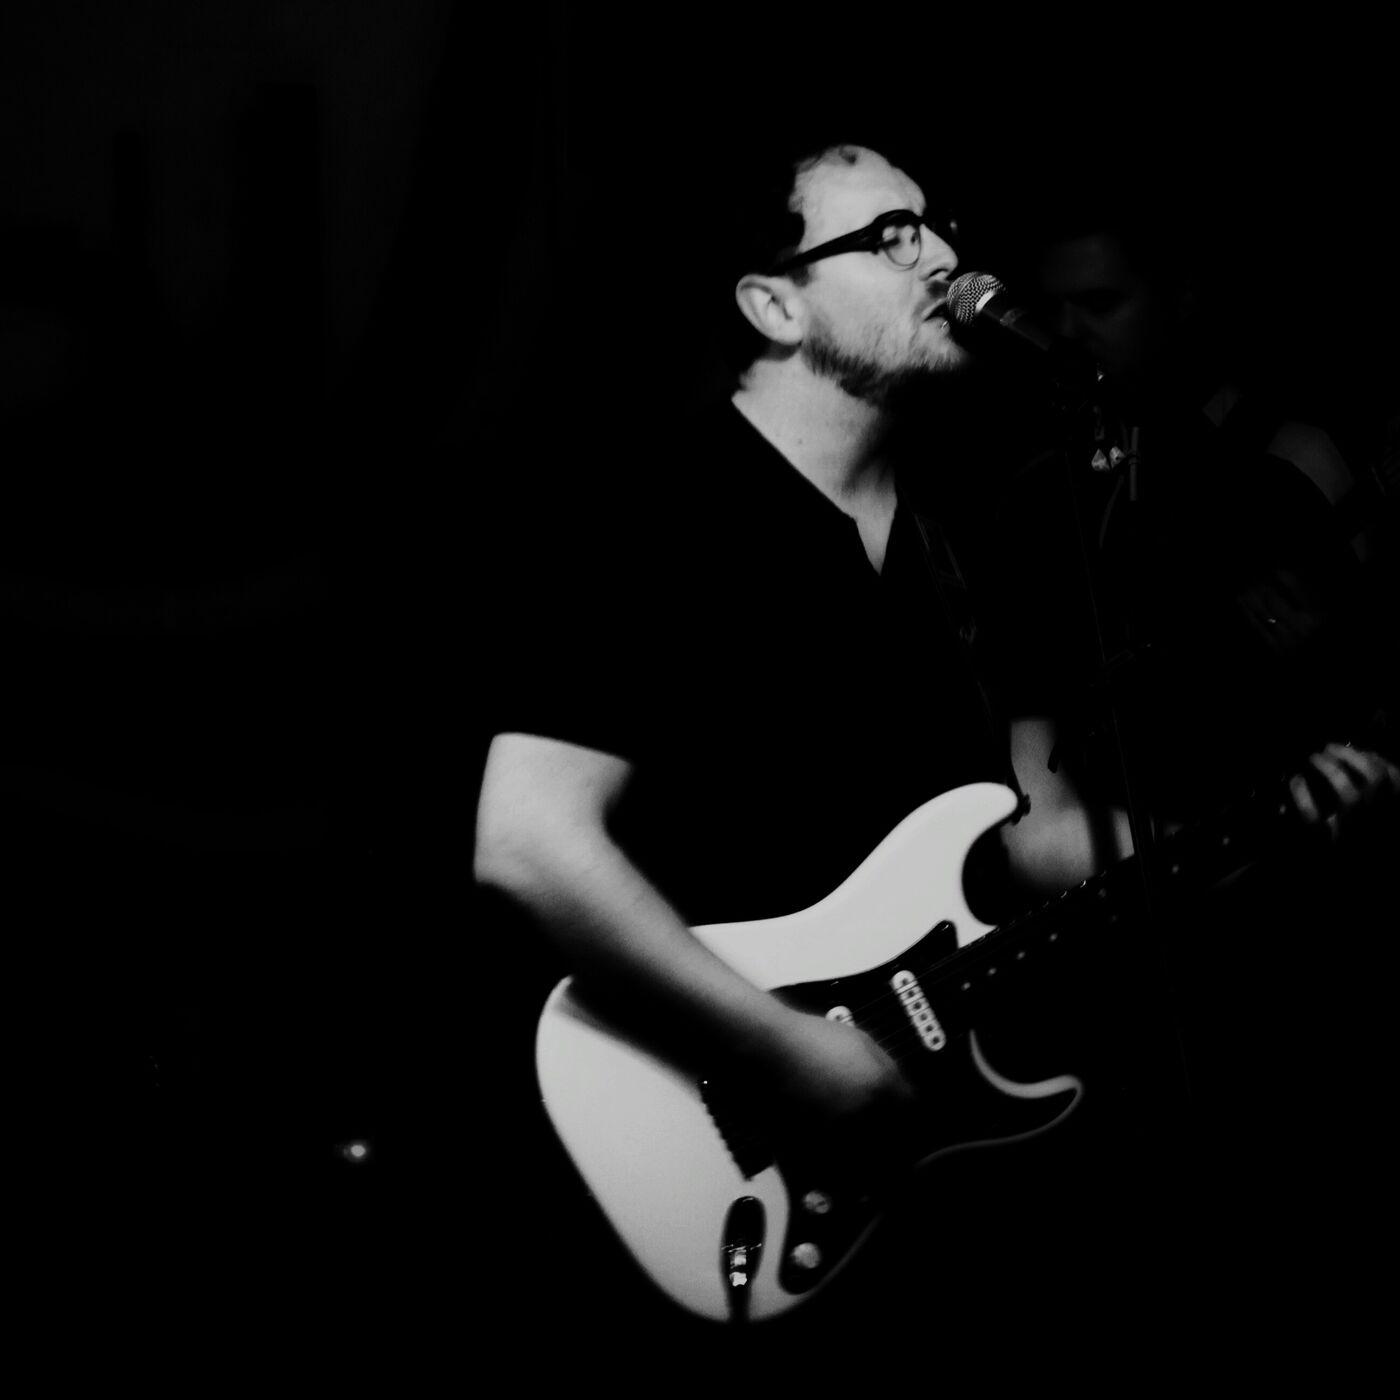 Music Masthun, Jesse Gimbel Builds Alluring Music.